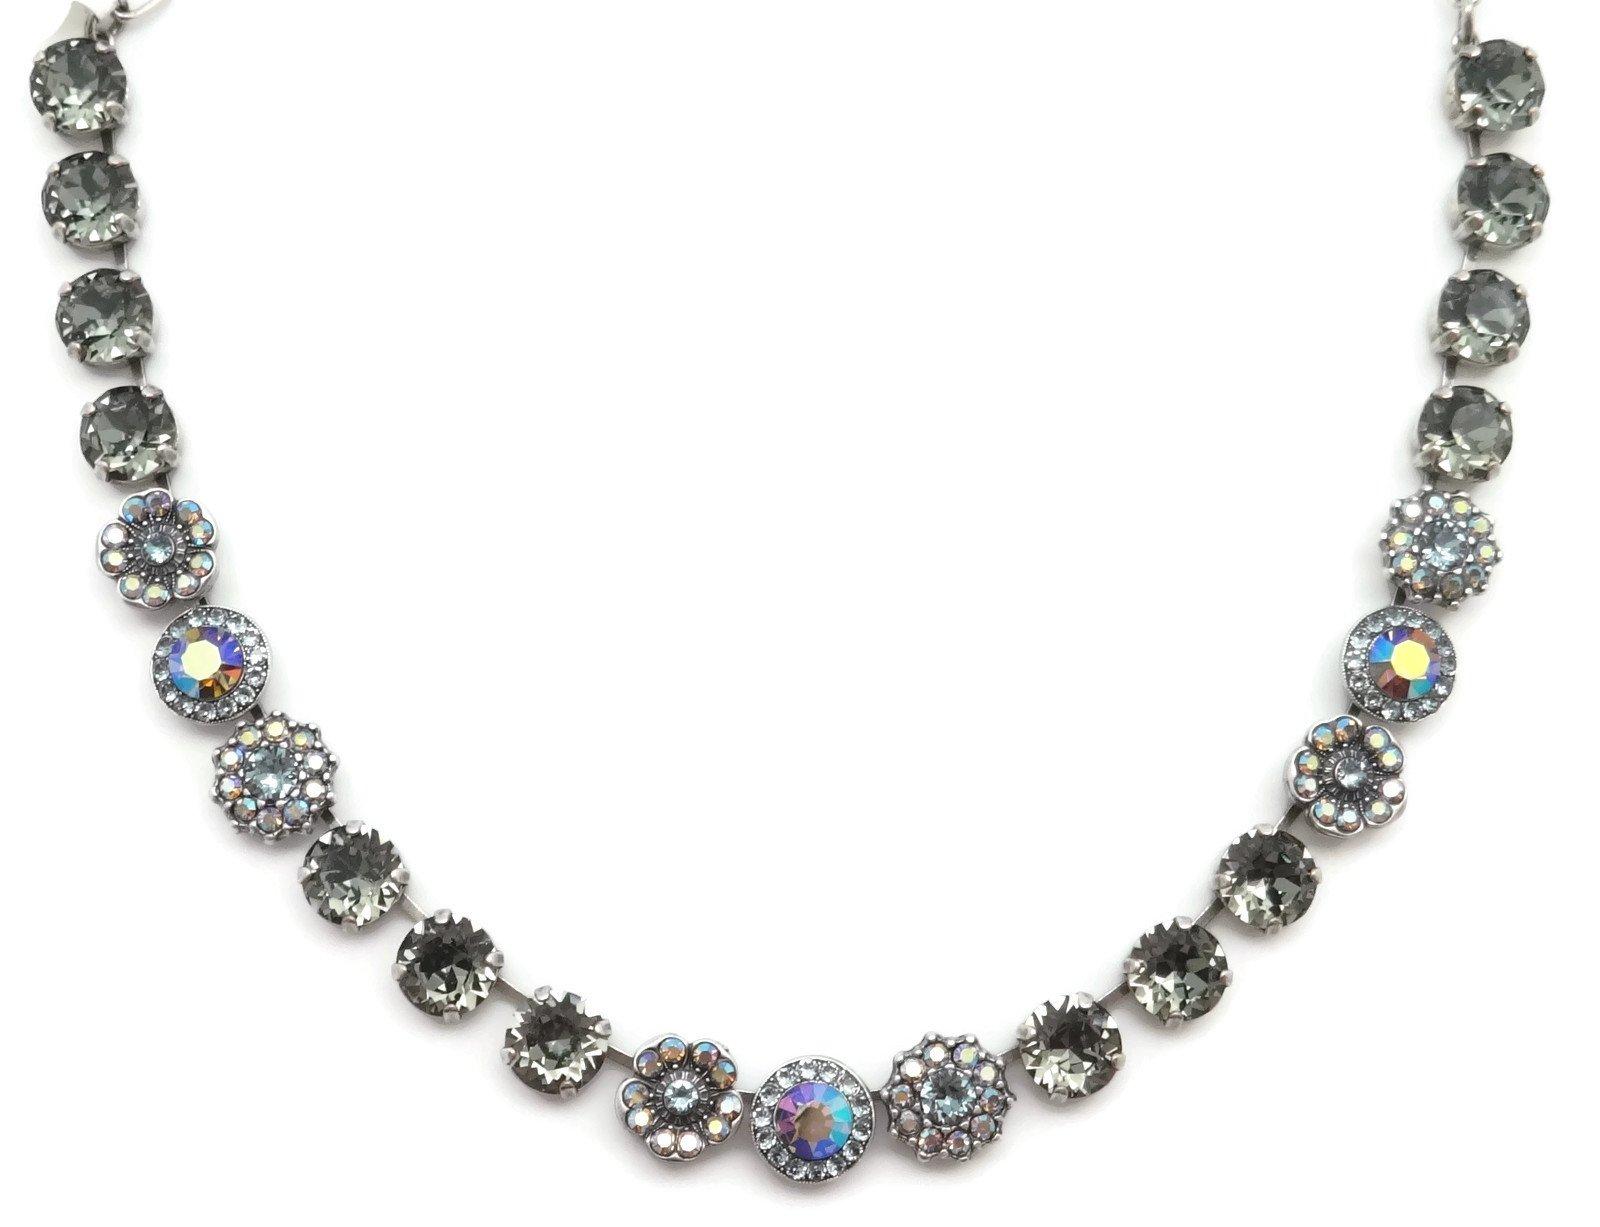 Mariana Swarovski Crystal Silver Plated Necklace Dark Grey Blue Flower Mosaic 215-3 Martini